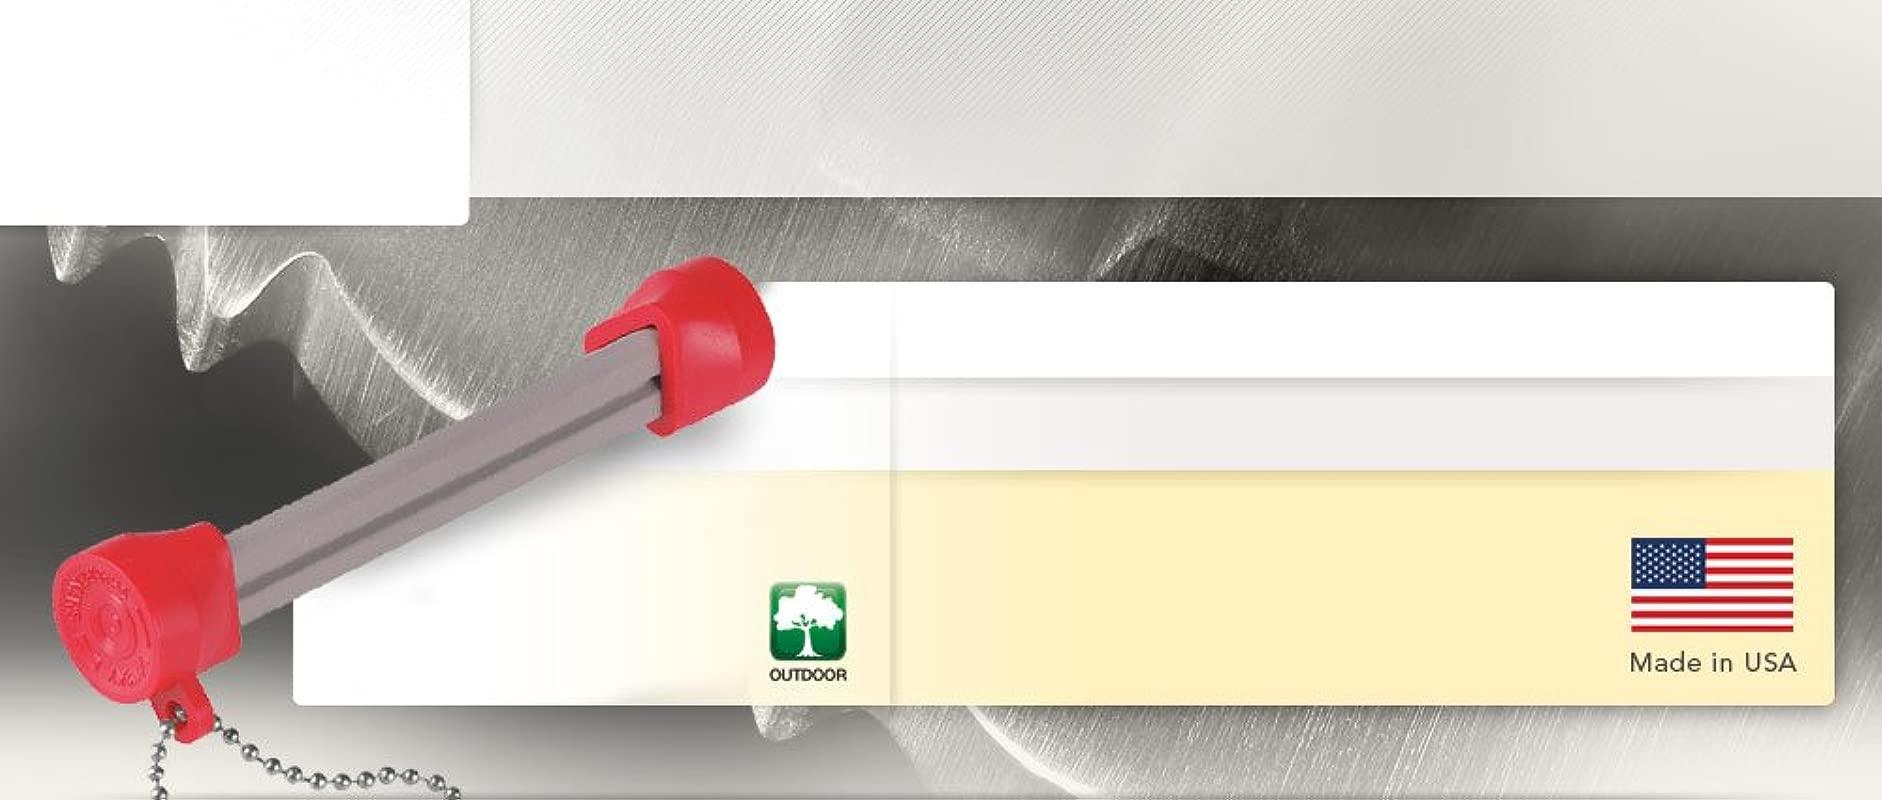 Lansky Spyder Sharpener Colors May Vary